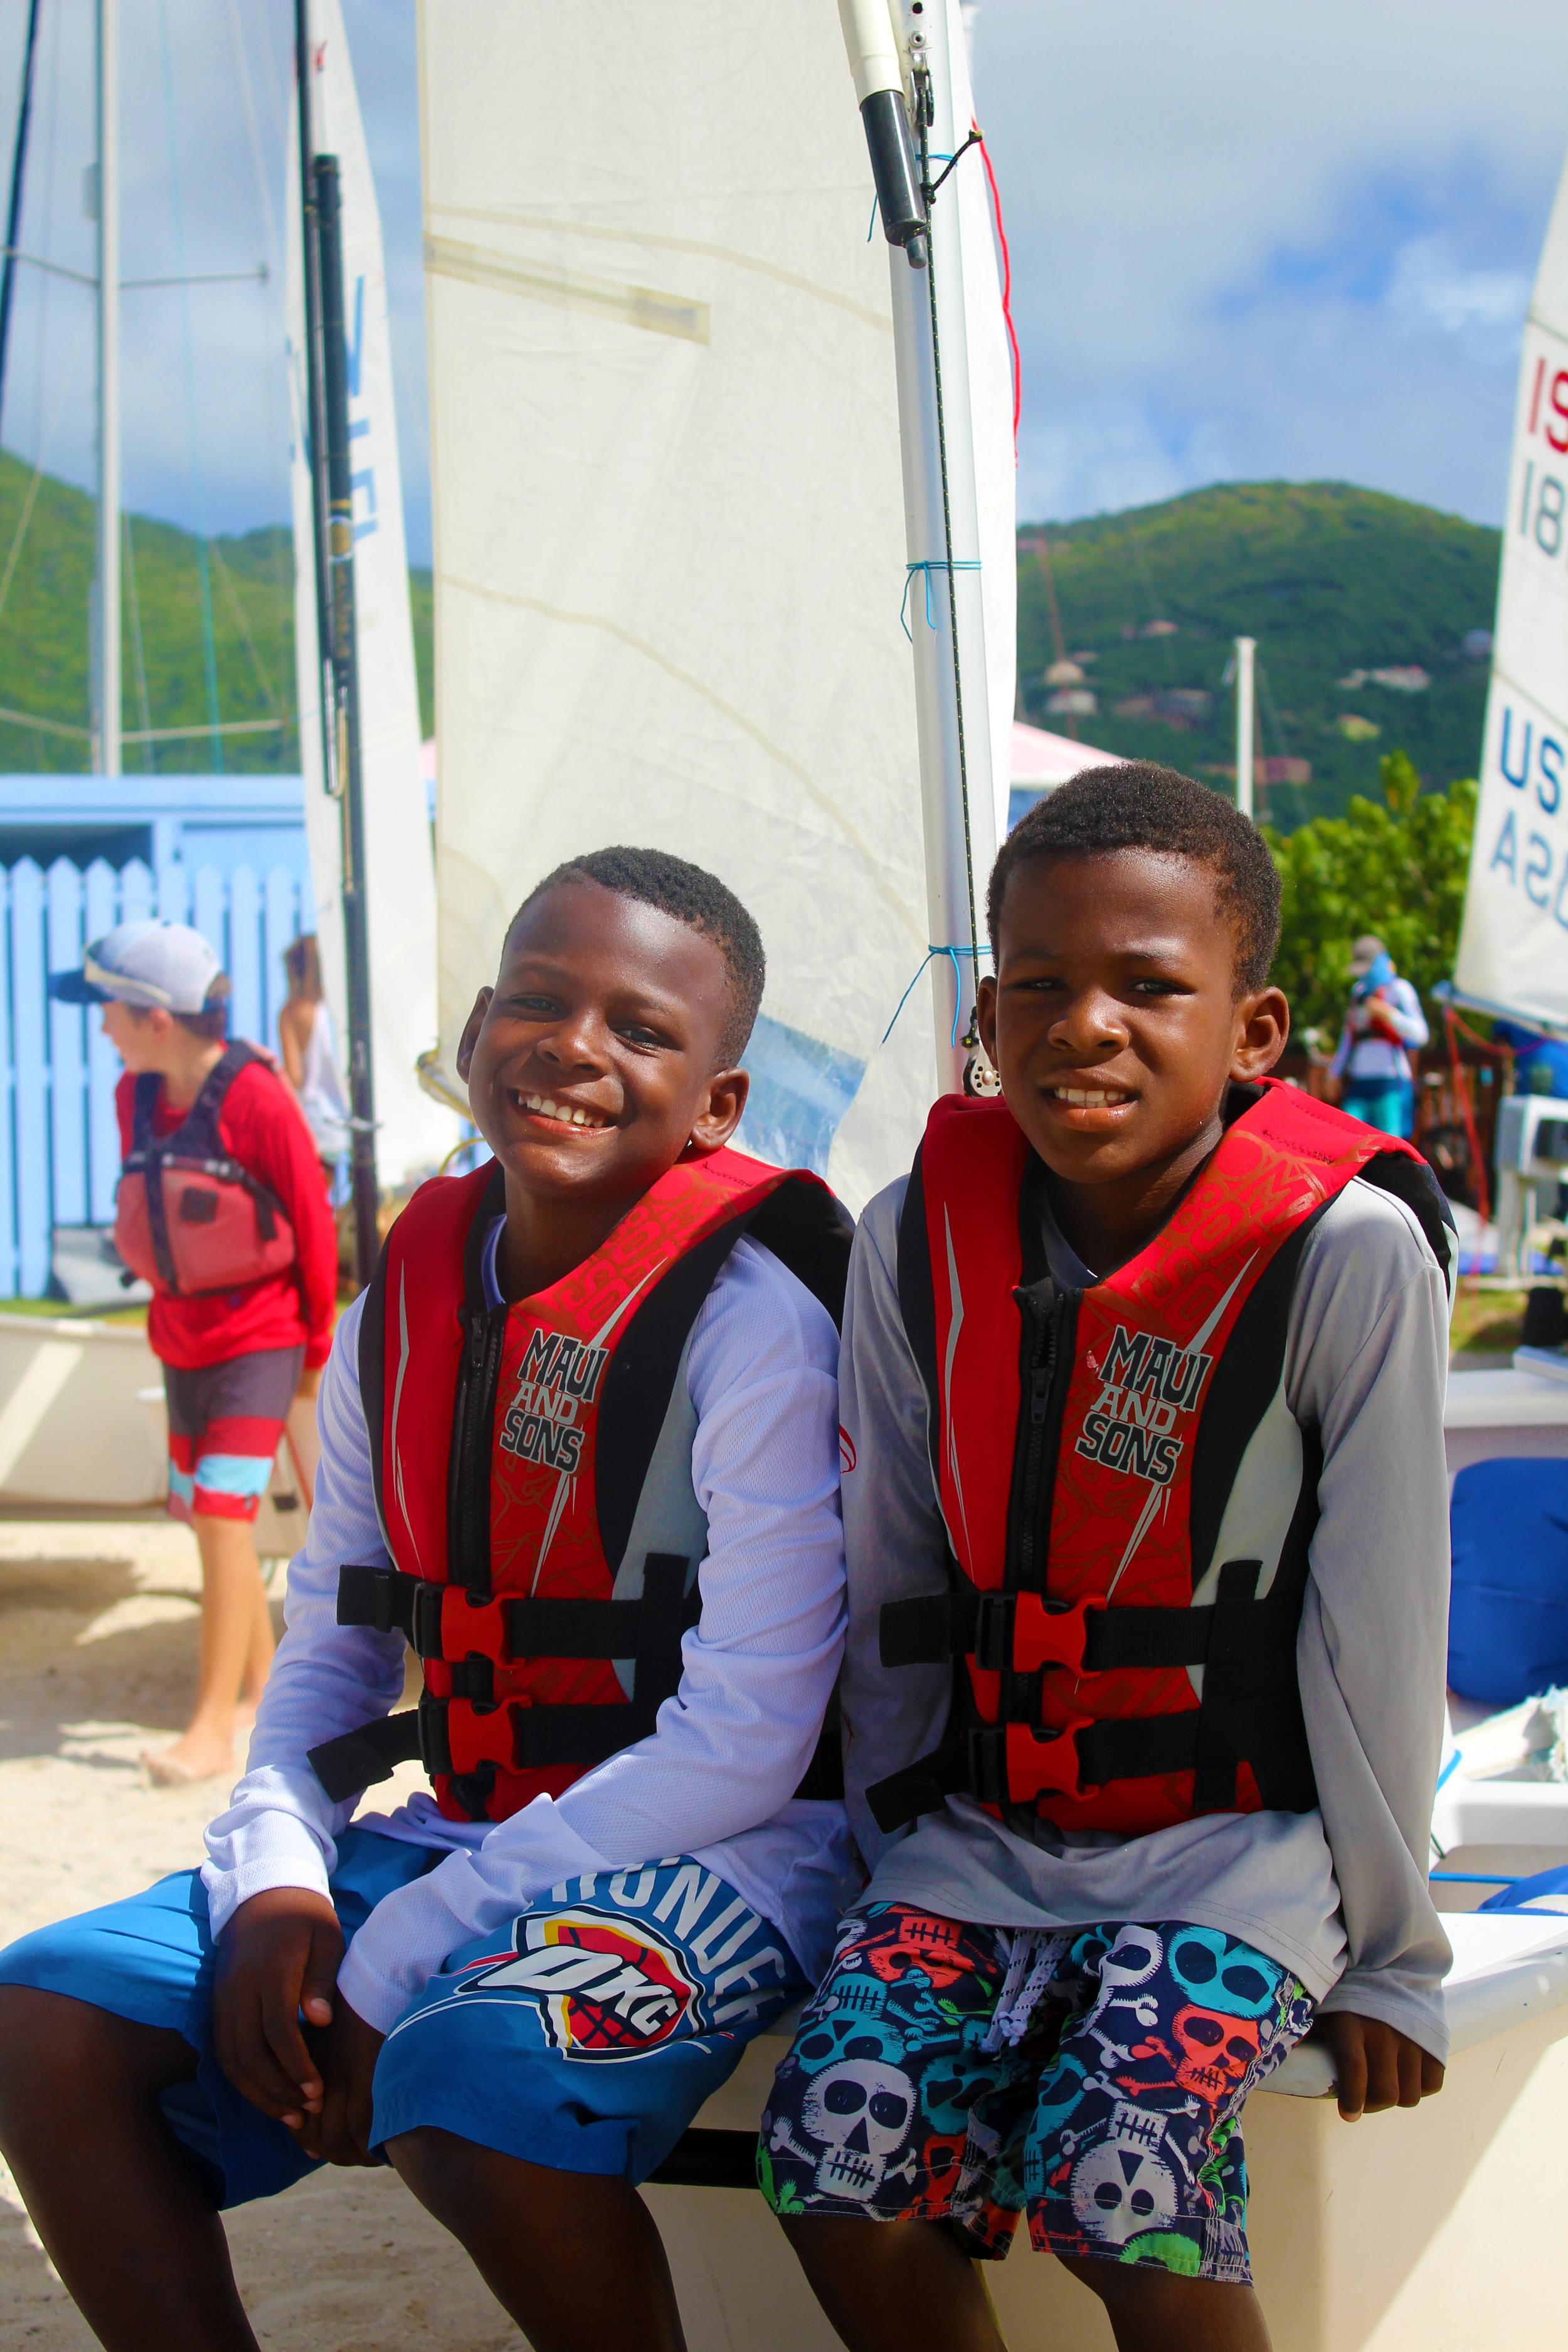 Rodney and Ryan Moorehead compete in Optimist Green fleet